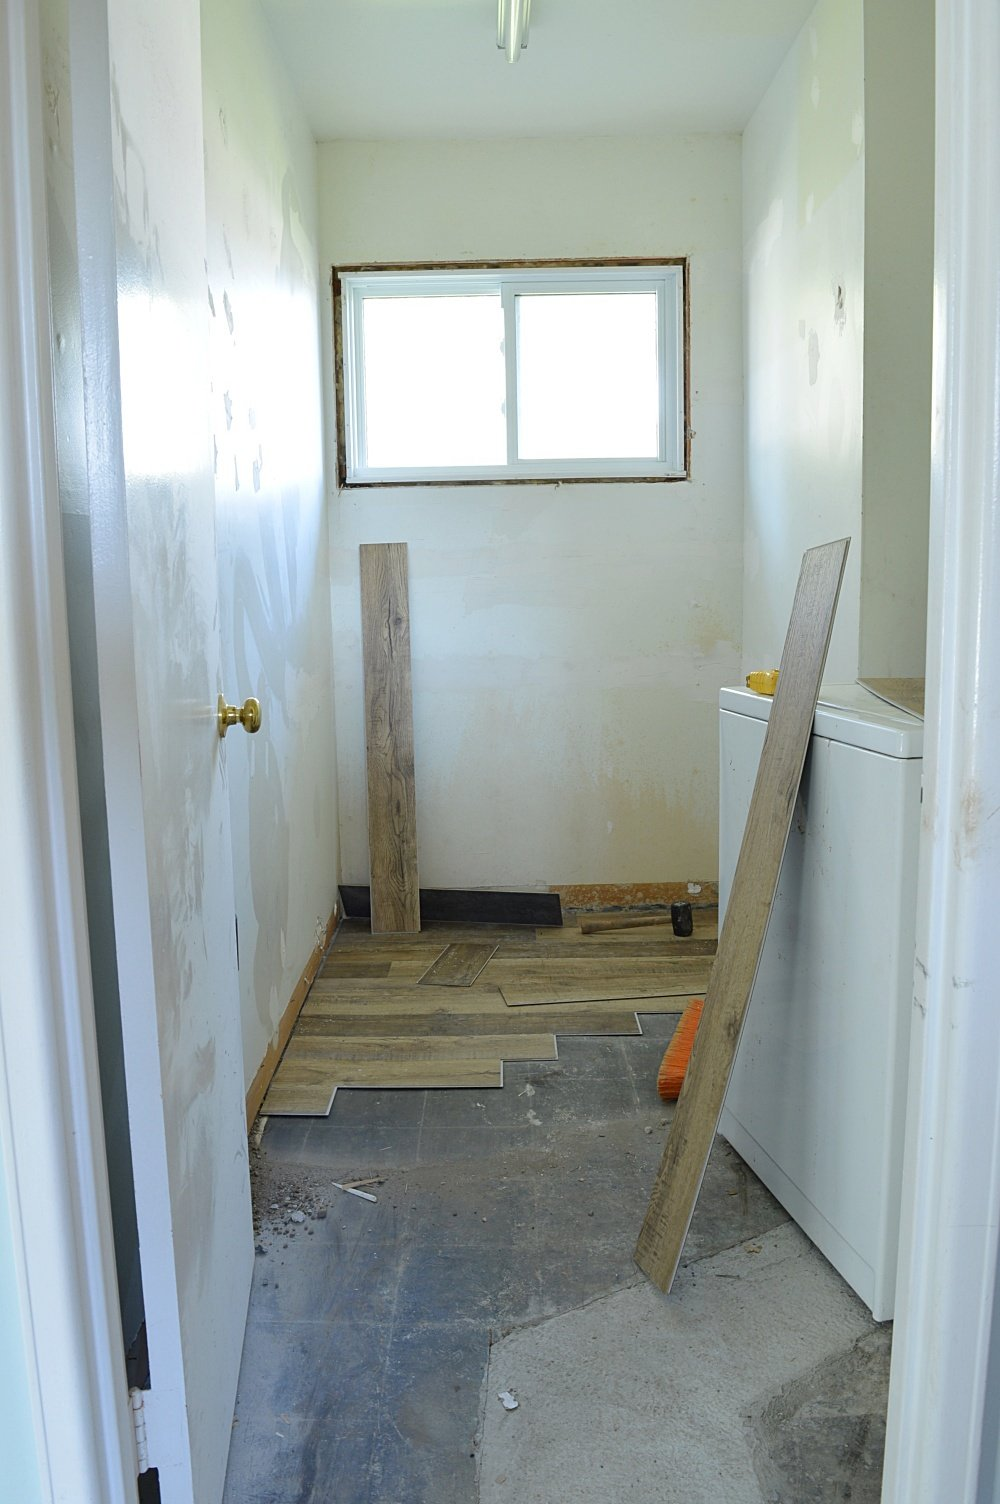 goodfellow vinyl plank flooring in a rental property